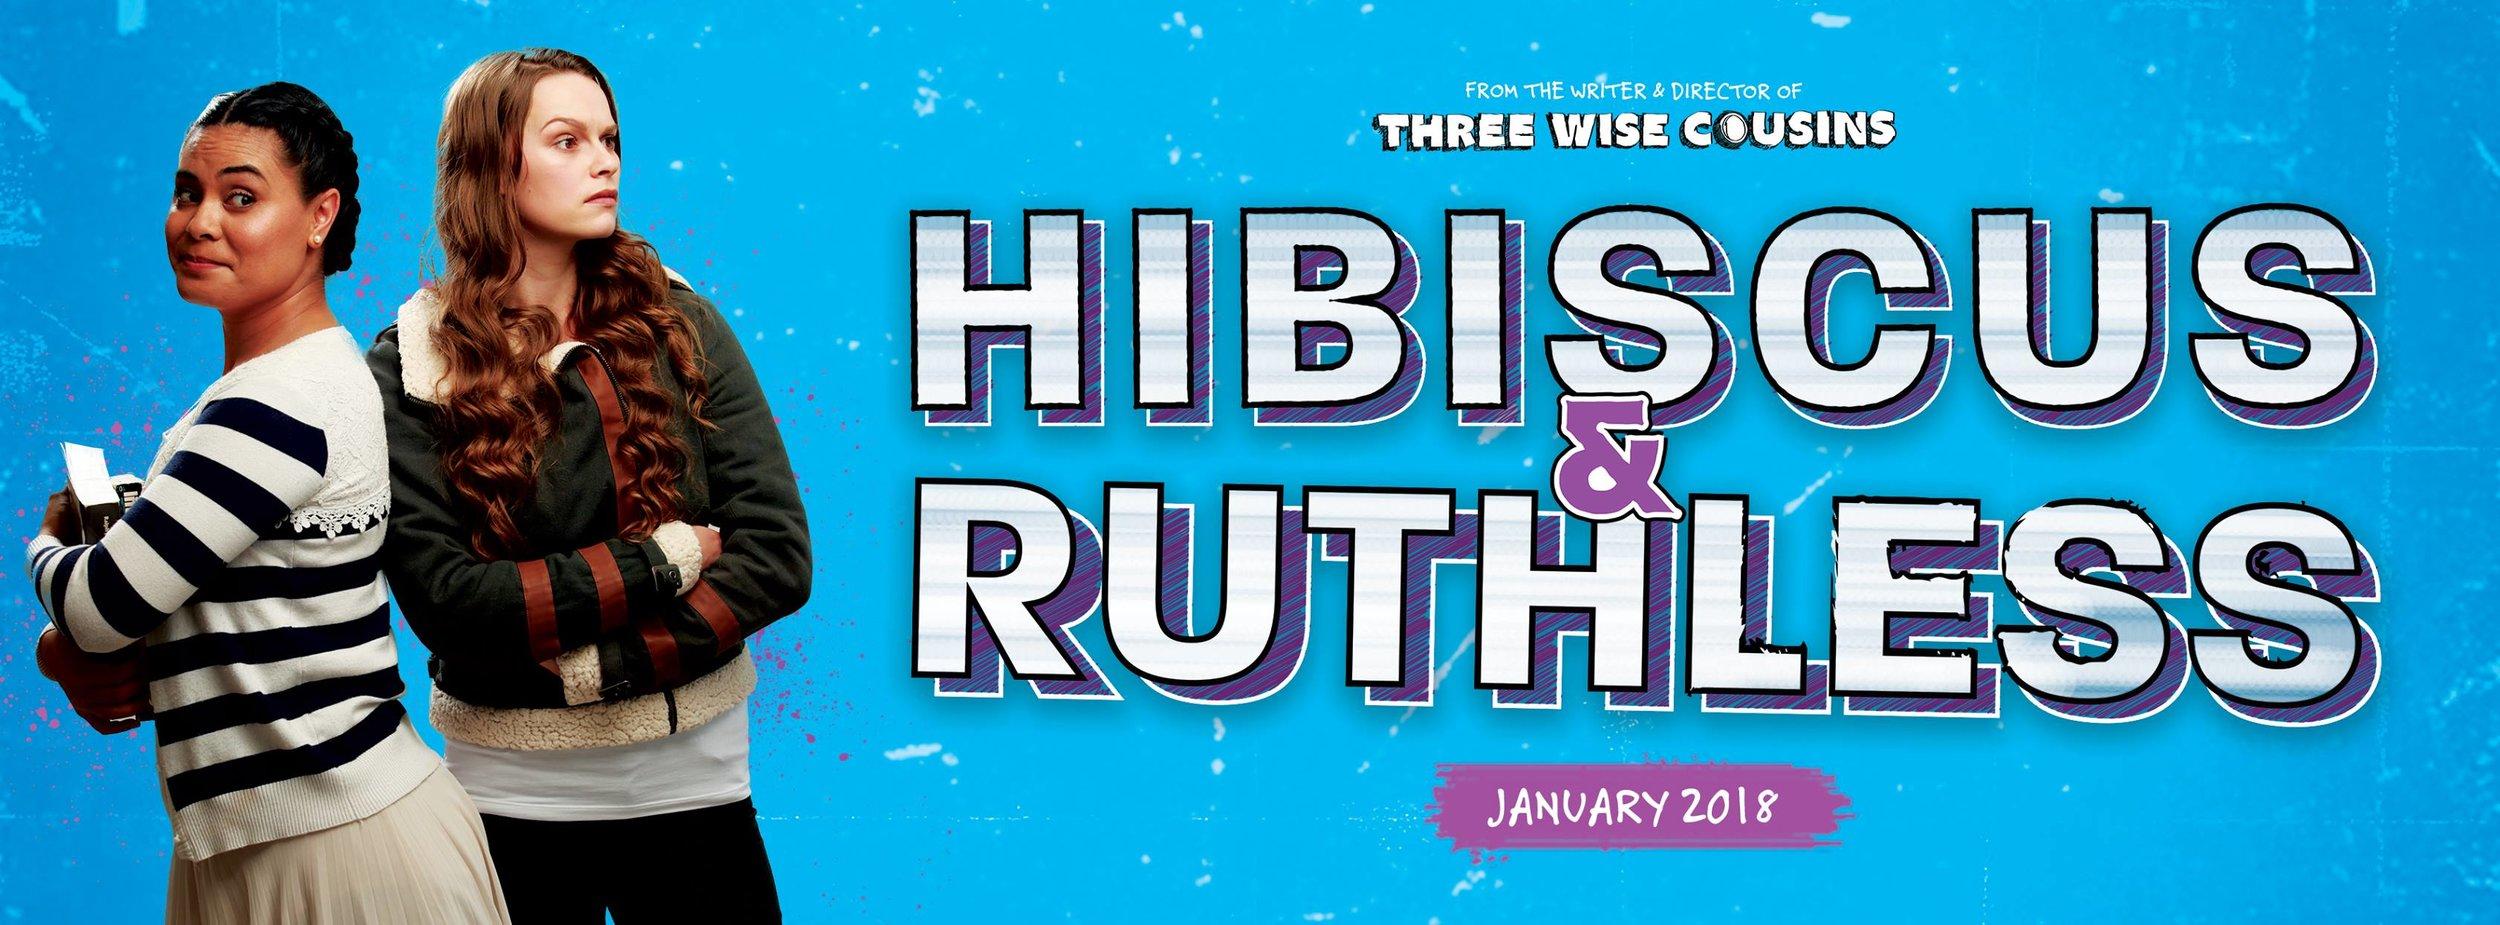 hibiscus & ruthless banner.jpg